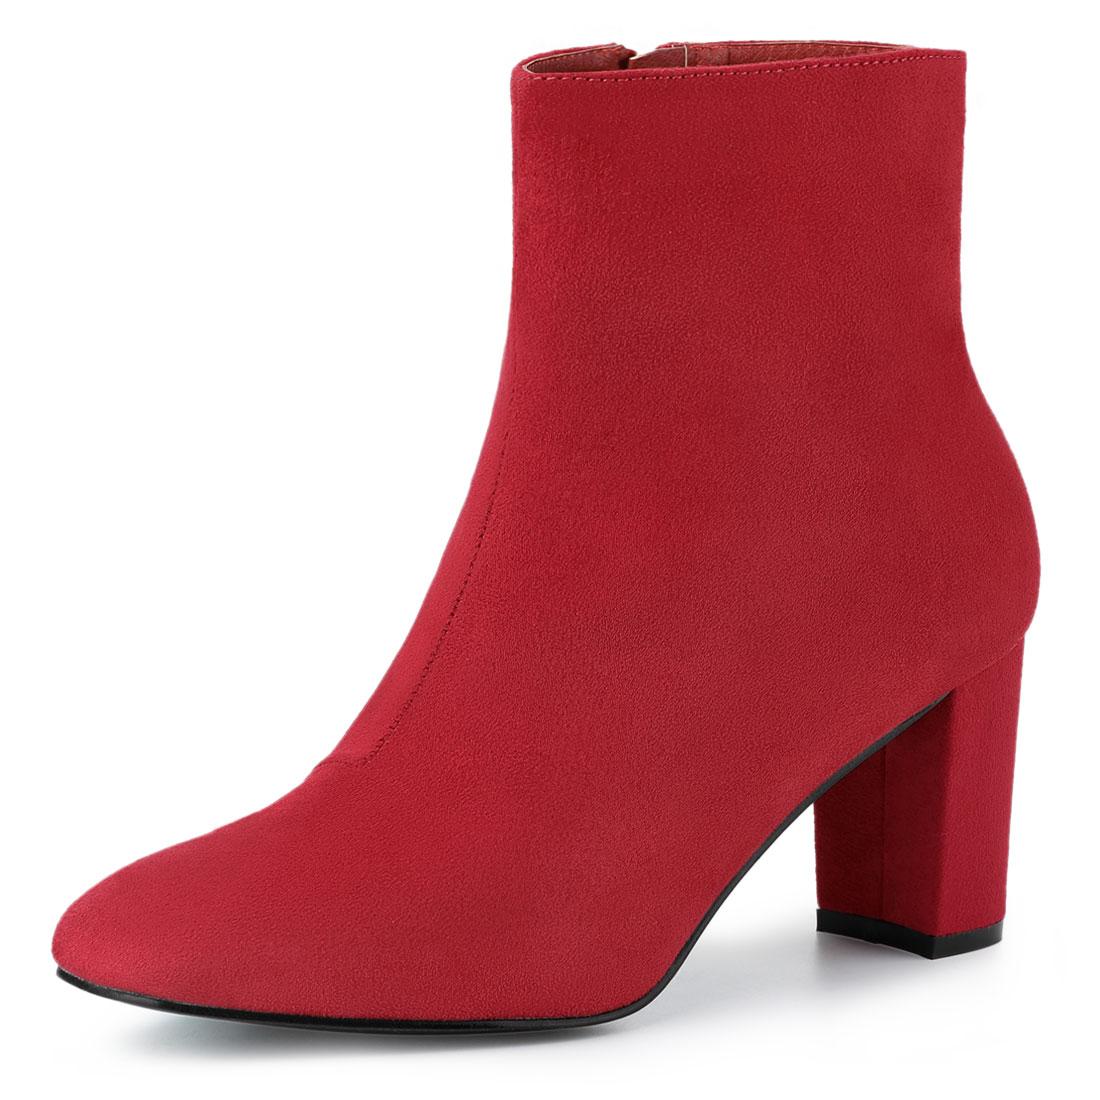 Allegra K Women's Dress Side Zip Chunky Heel Ankle Boots Red US 8